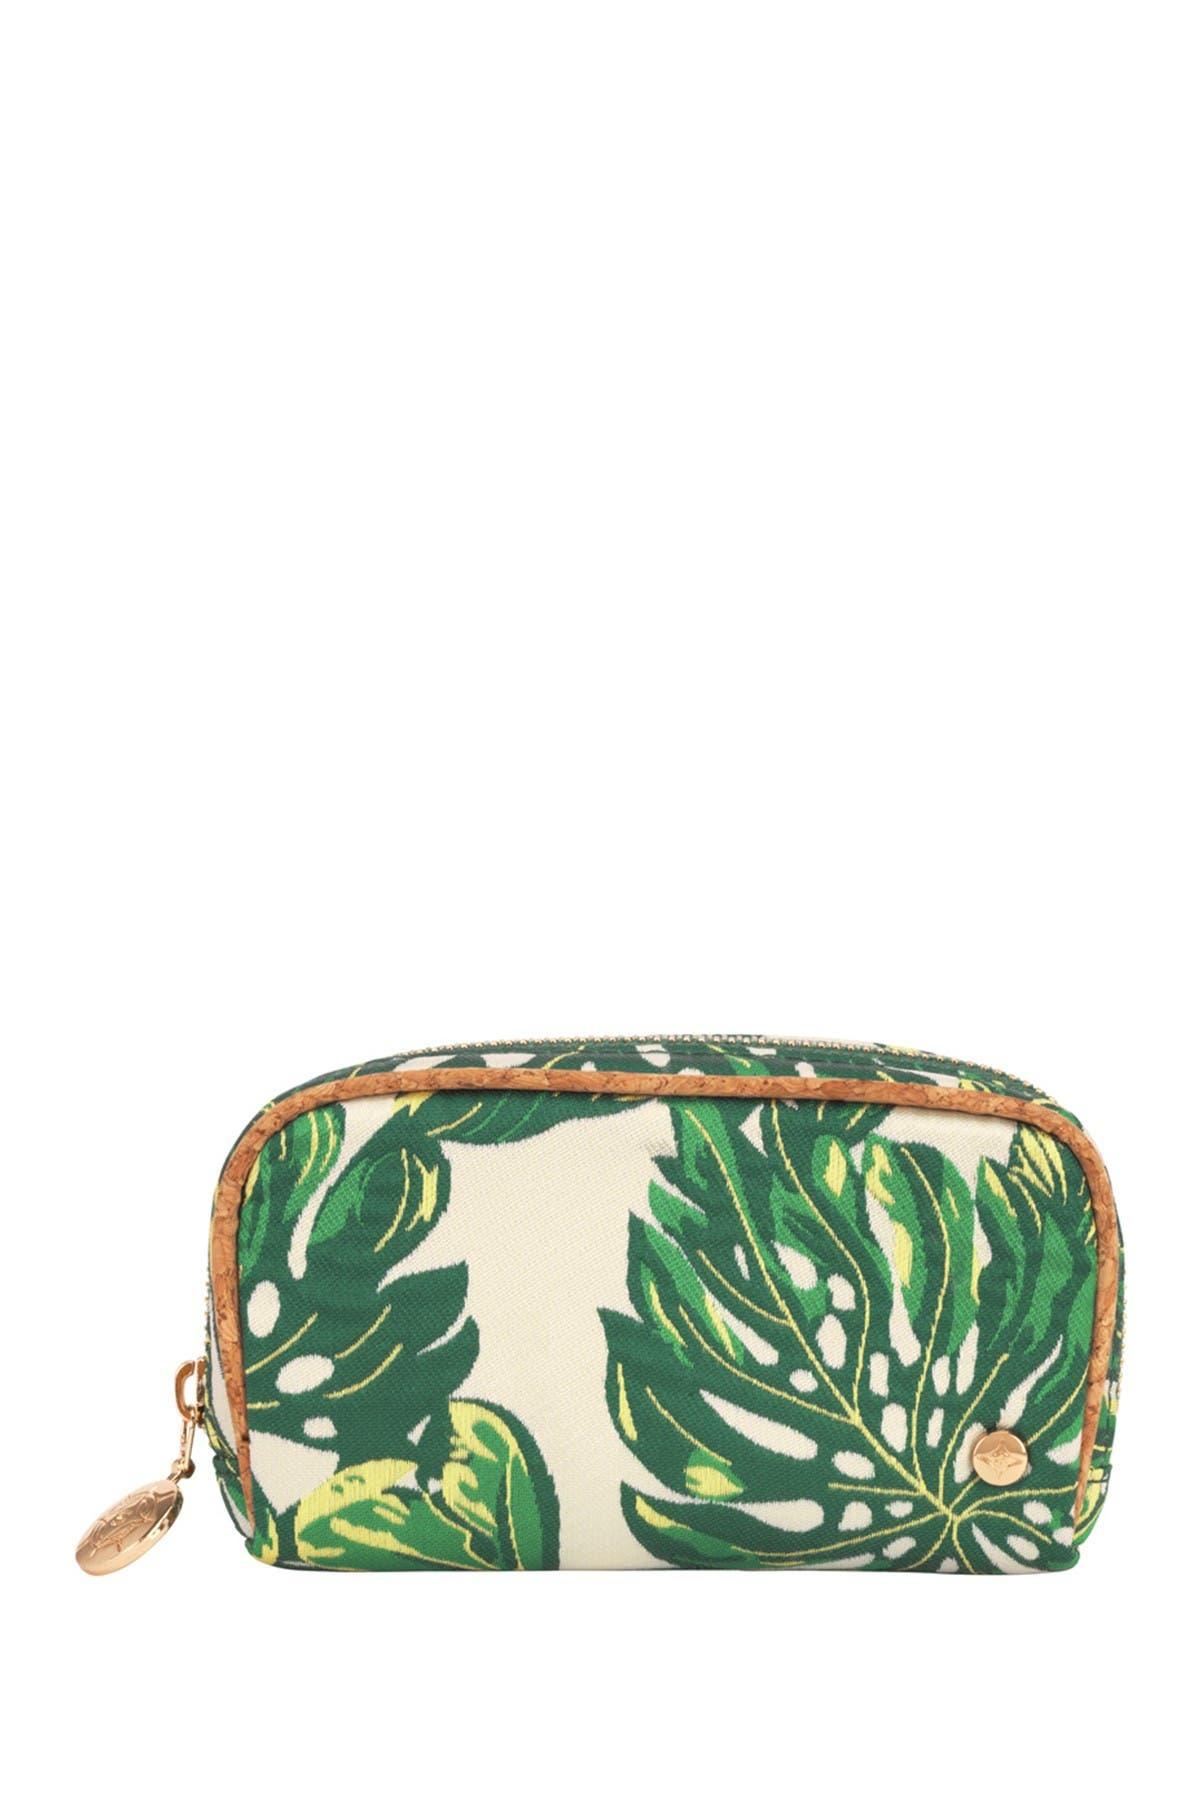 Stephanie Johnson Seychelles Mini Pouch - Green